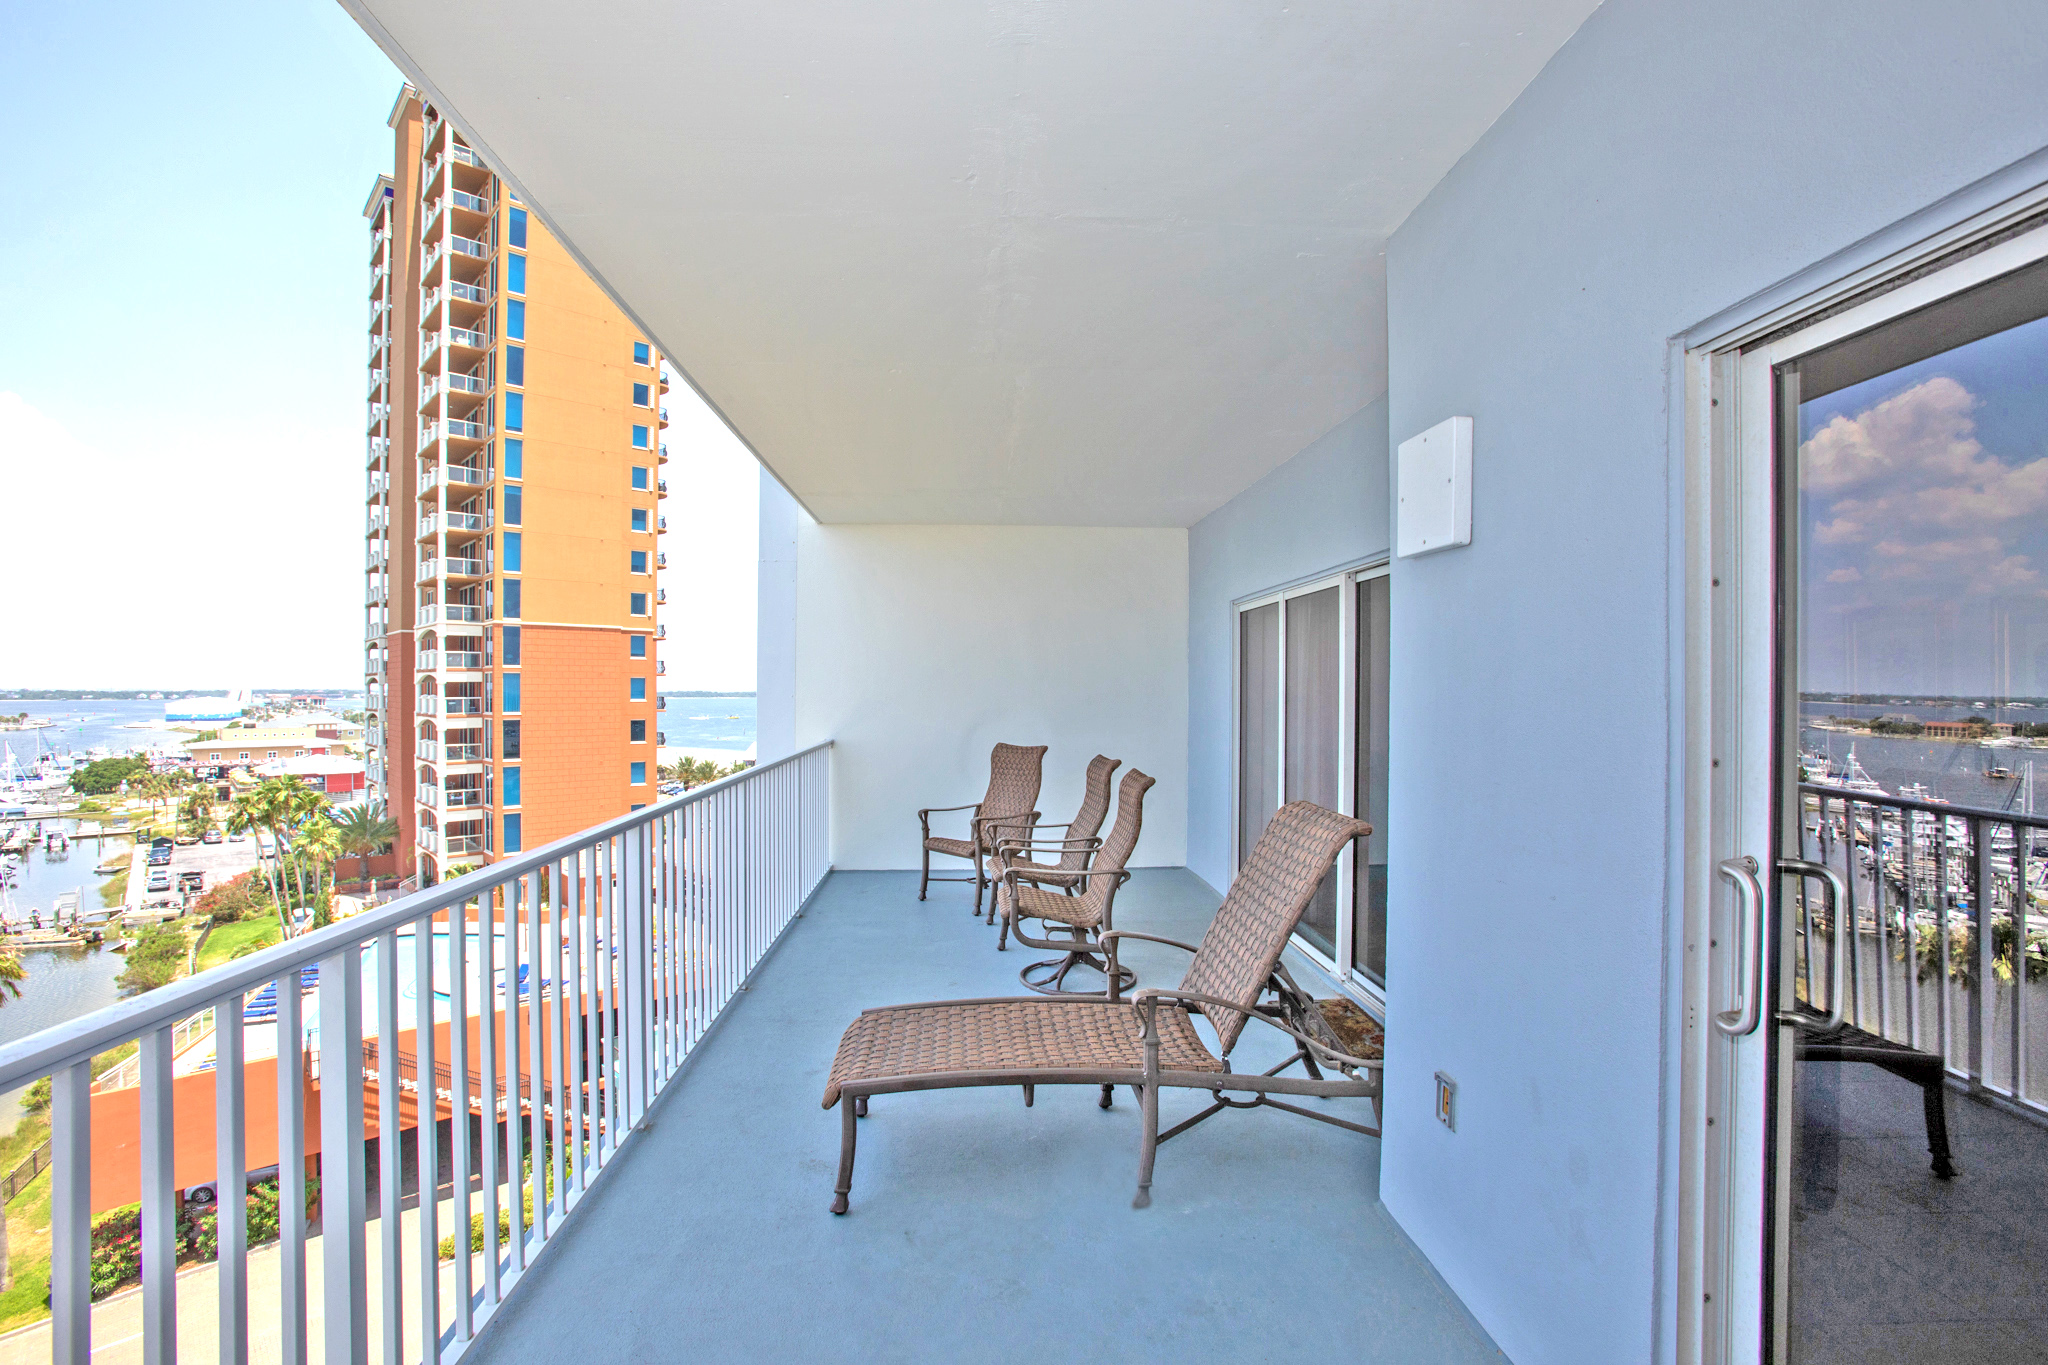 South Harbour #7E Condo rental in South Harbour ~ Pensacola Beach Vacation Rentals by BeachGuide in Pensacola Beach Florida - #19